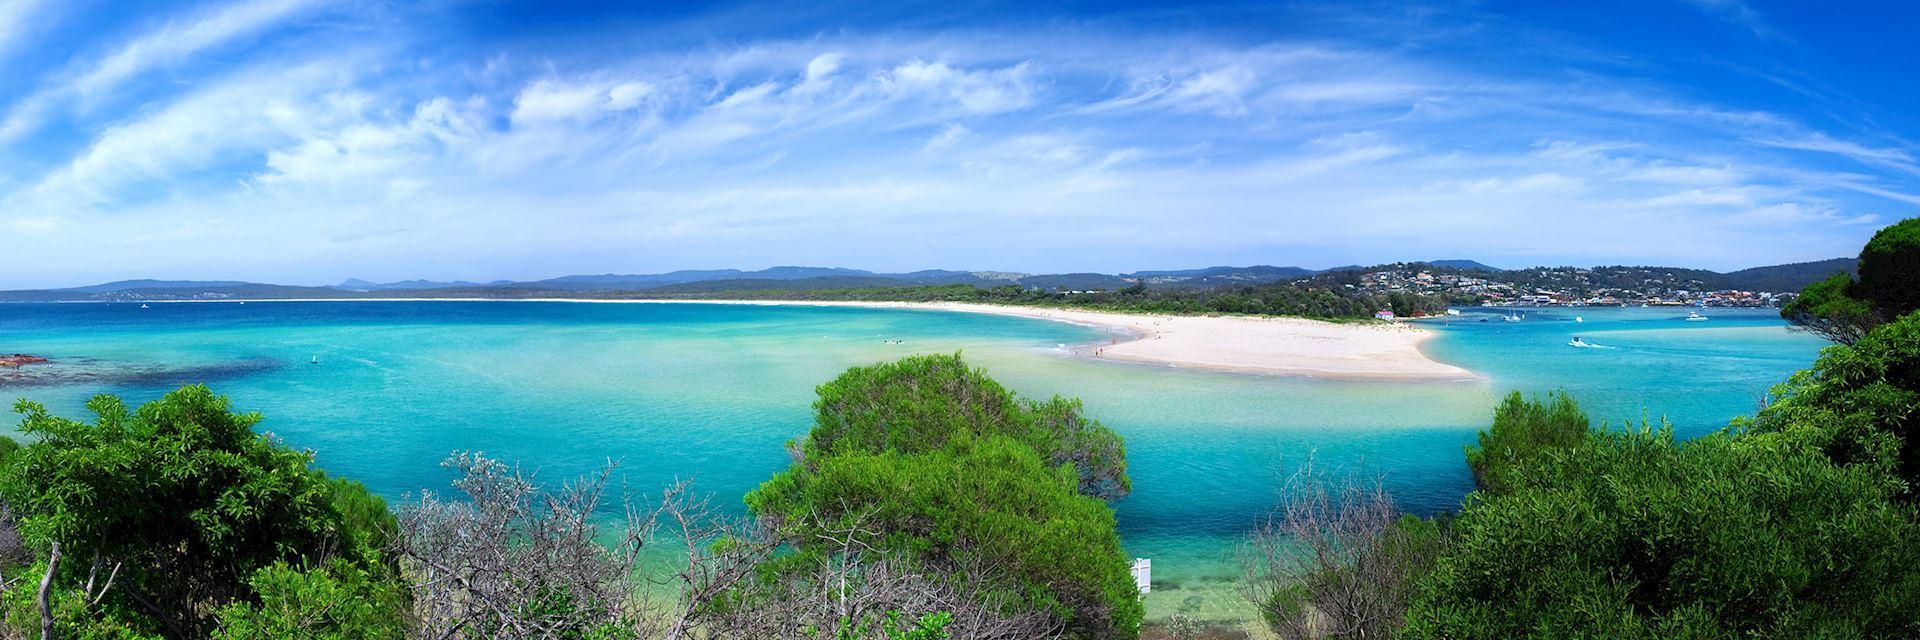 Merimbula coastline